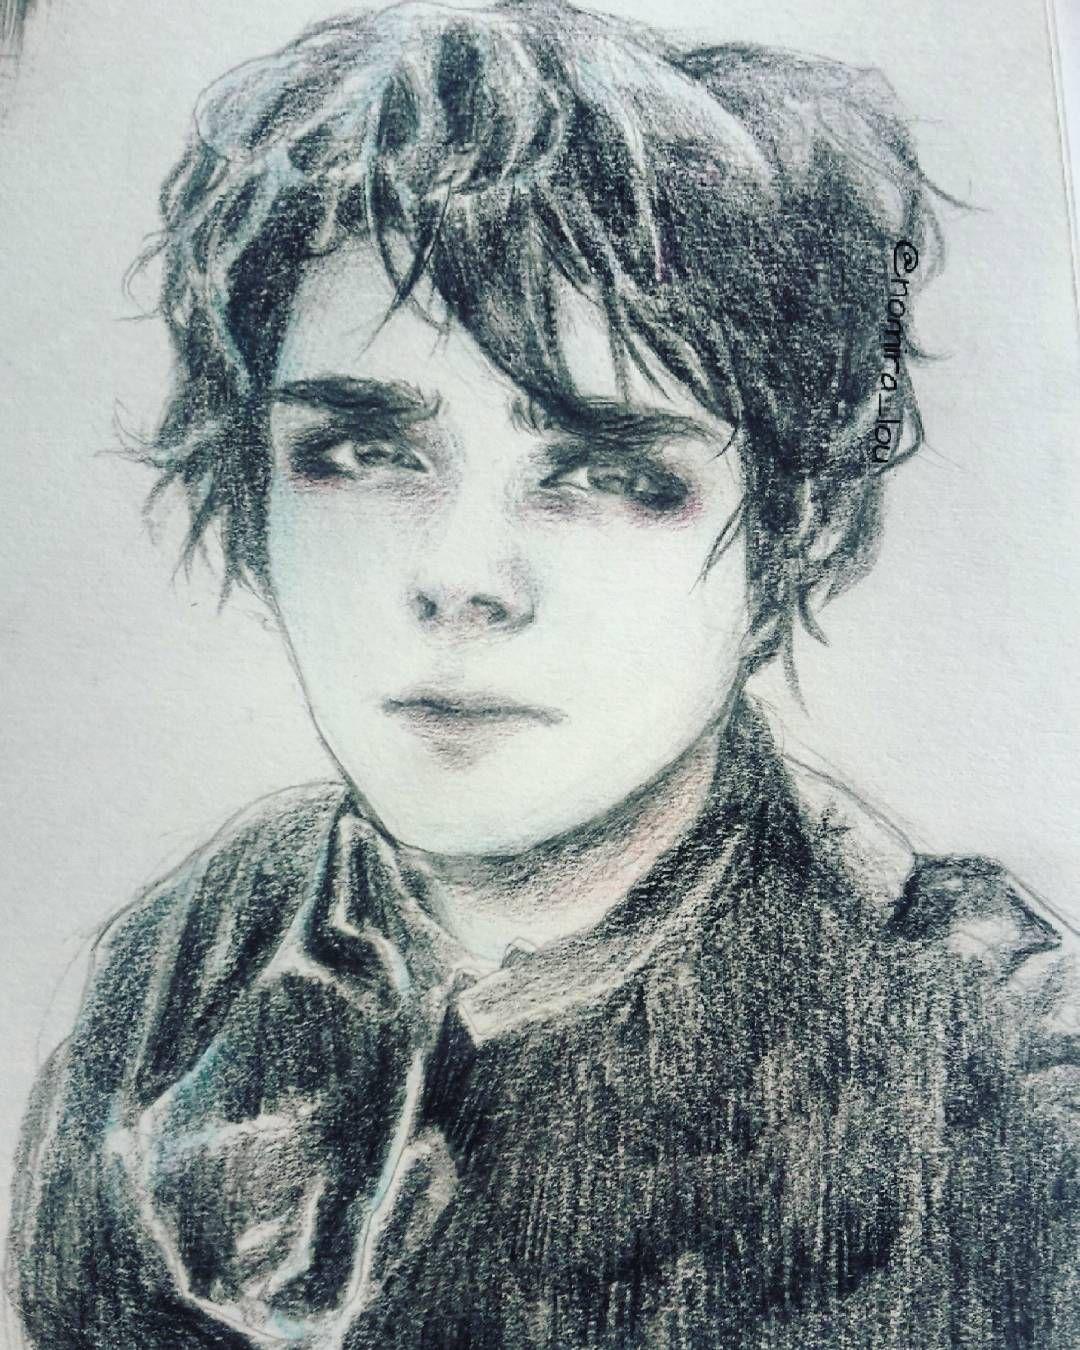 portrait shading realism artist drawing draw pencil realistic art